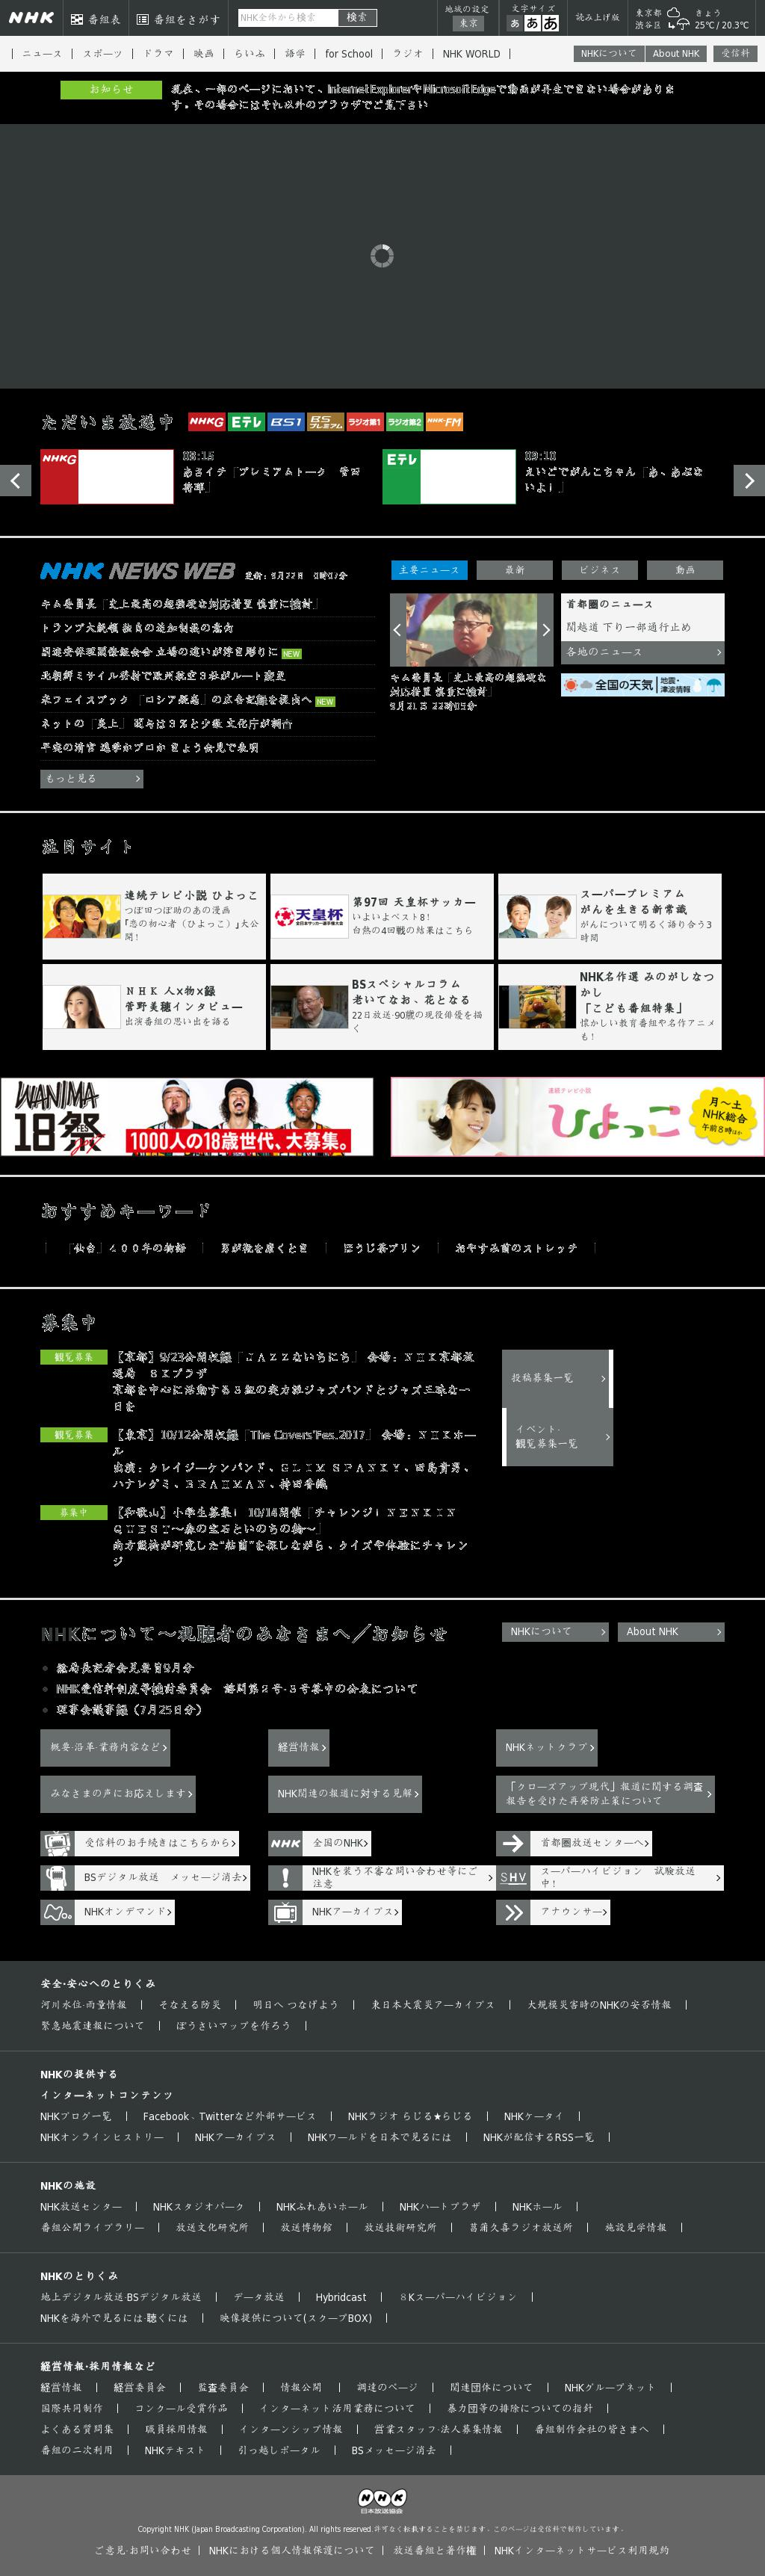 NHK Online at Friday Sept. 22, 2017, 12:13 a.m. UTC